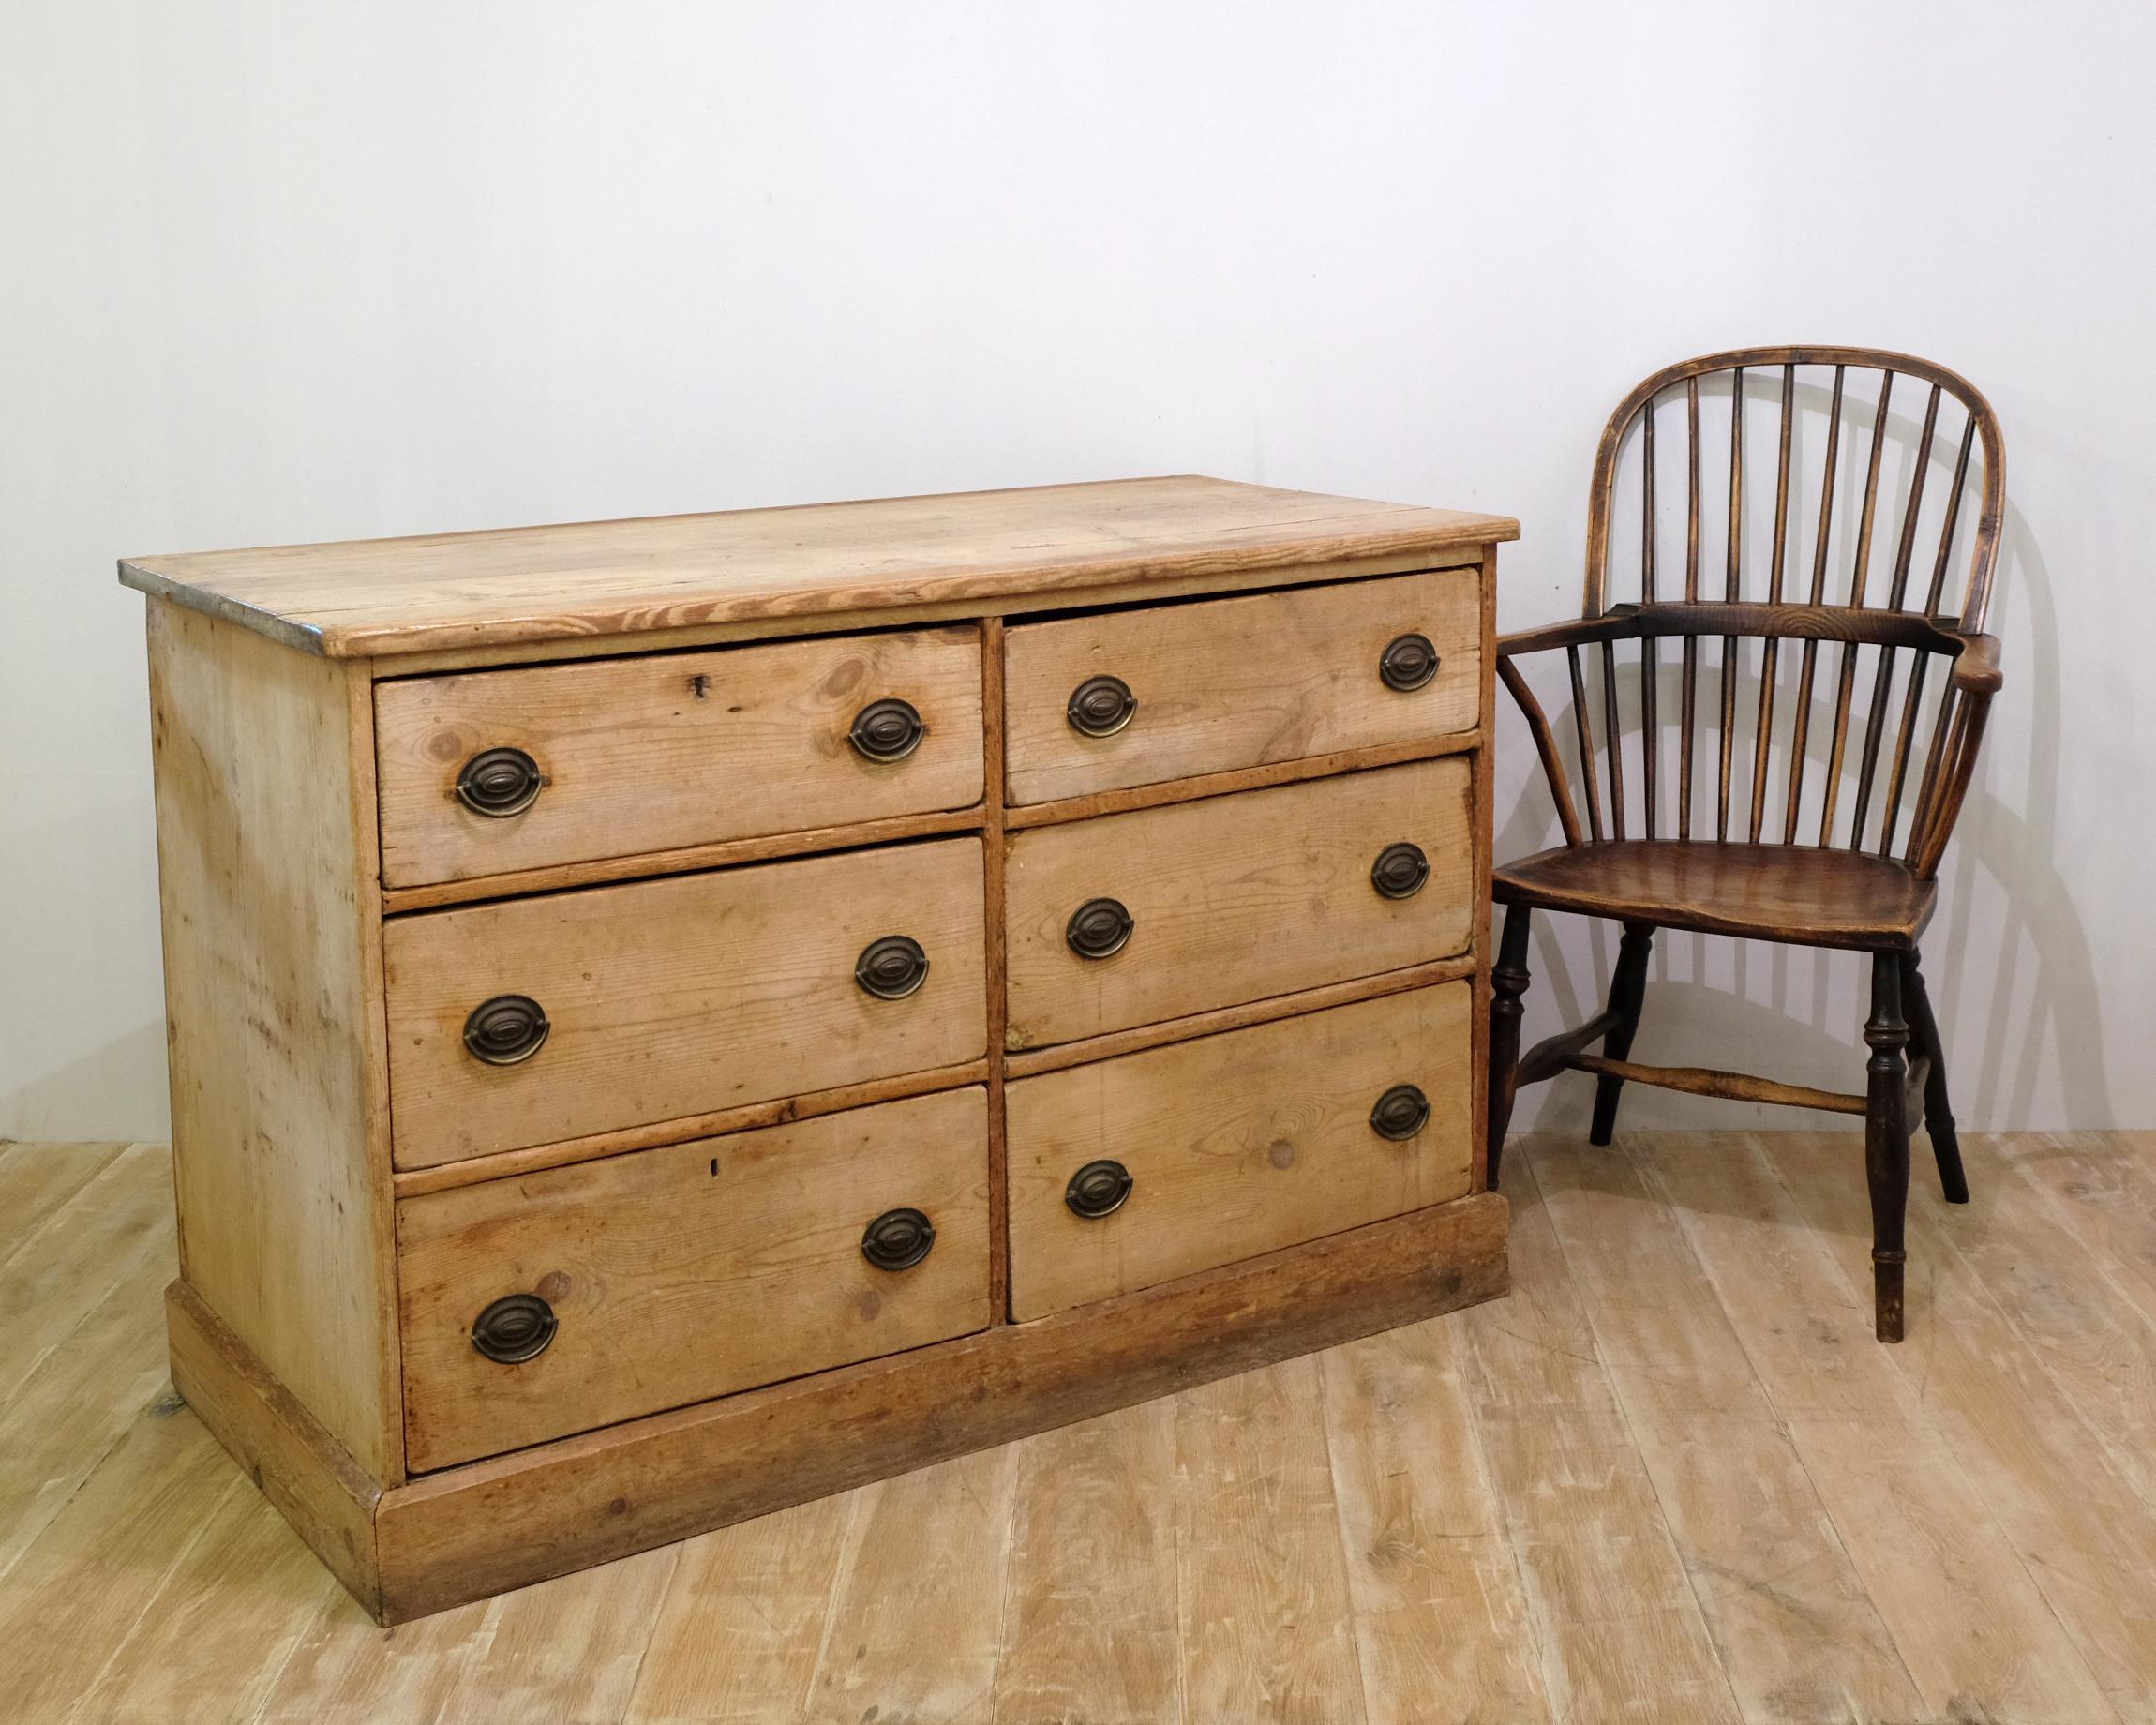 Pine Furniture remains a terrific option